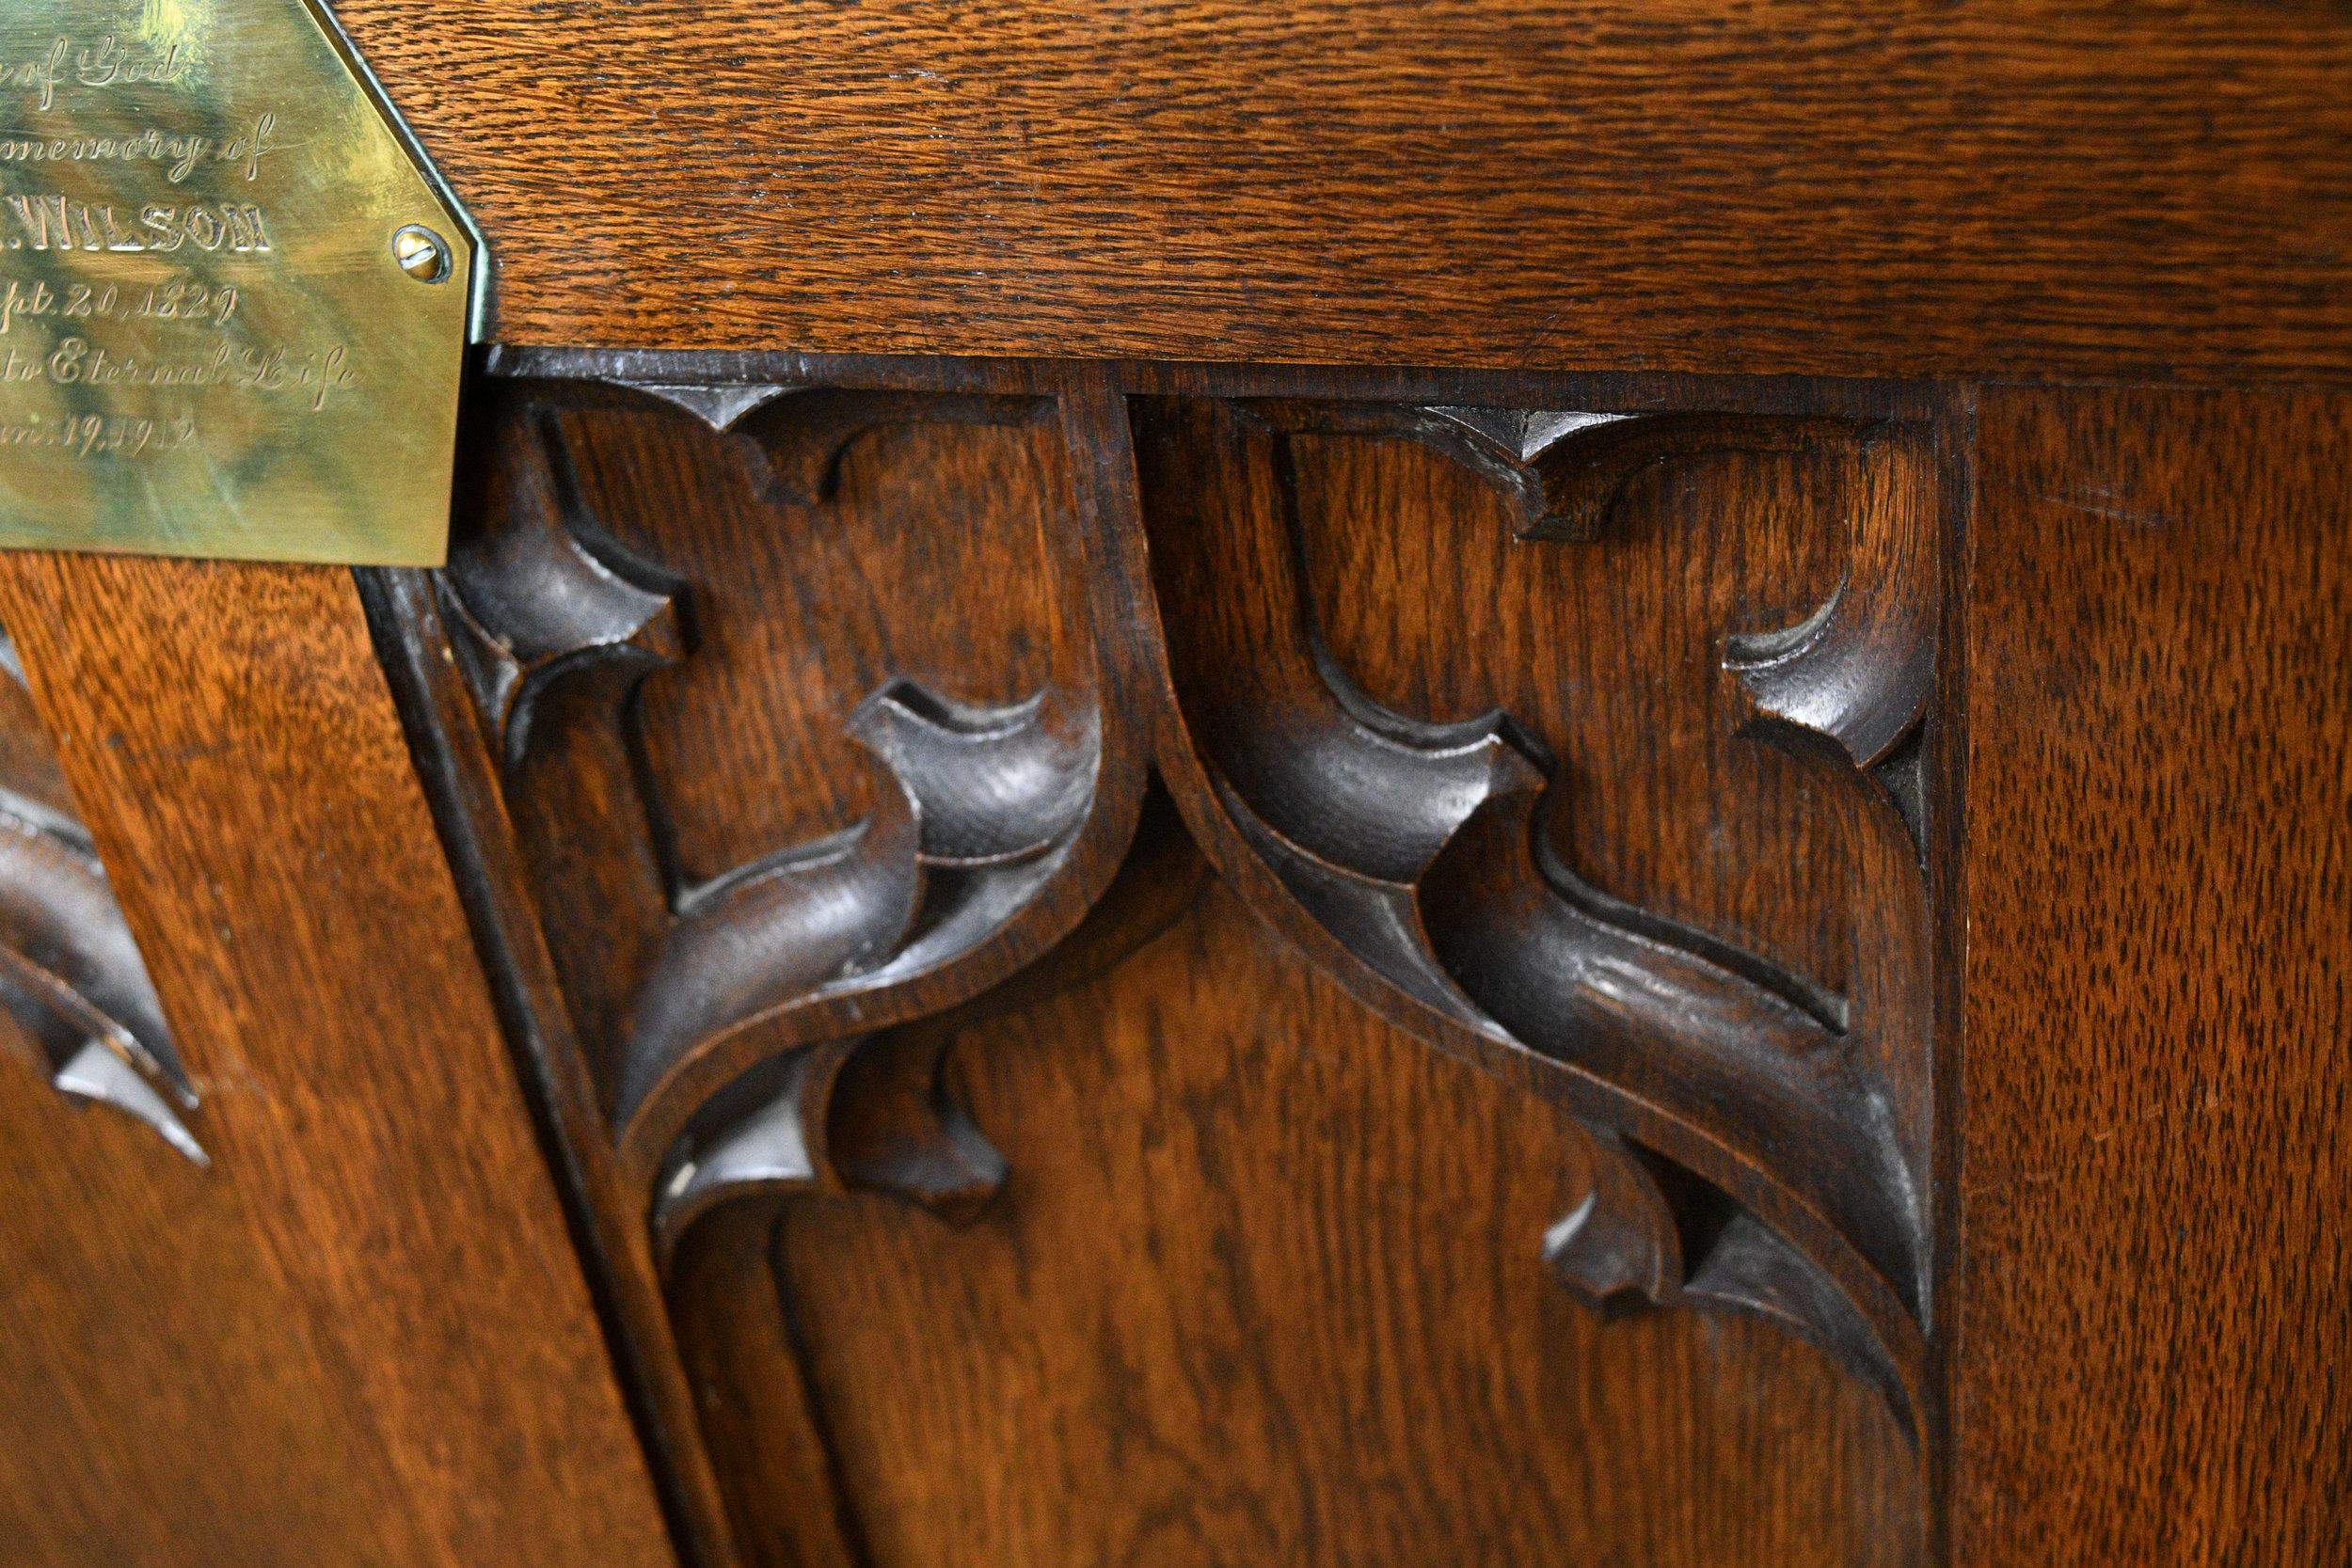 47682-oak-kneeler-close-up-5.jpg